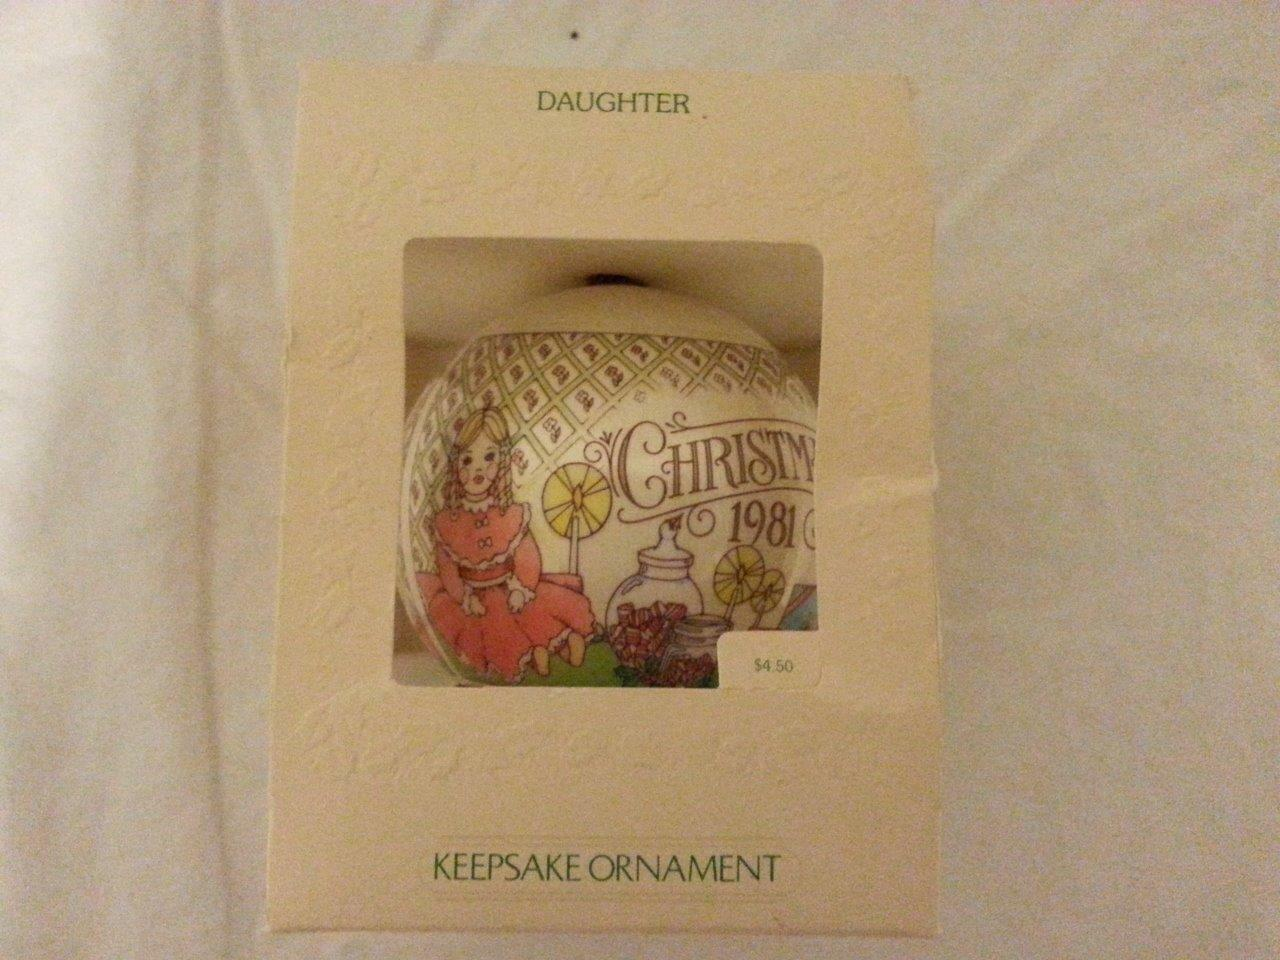 HALLMARK SATIN ORNAMENT VINTAGE DATED 1981 DAUGHTER IN ORIGINAL BOX